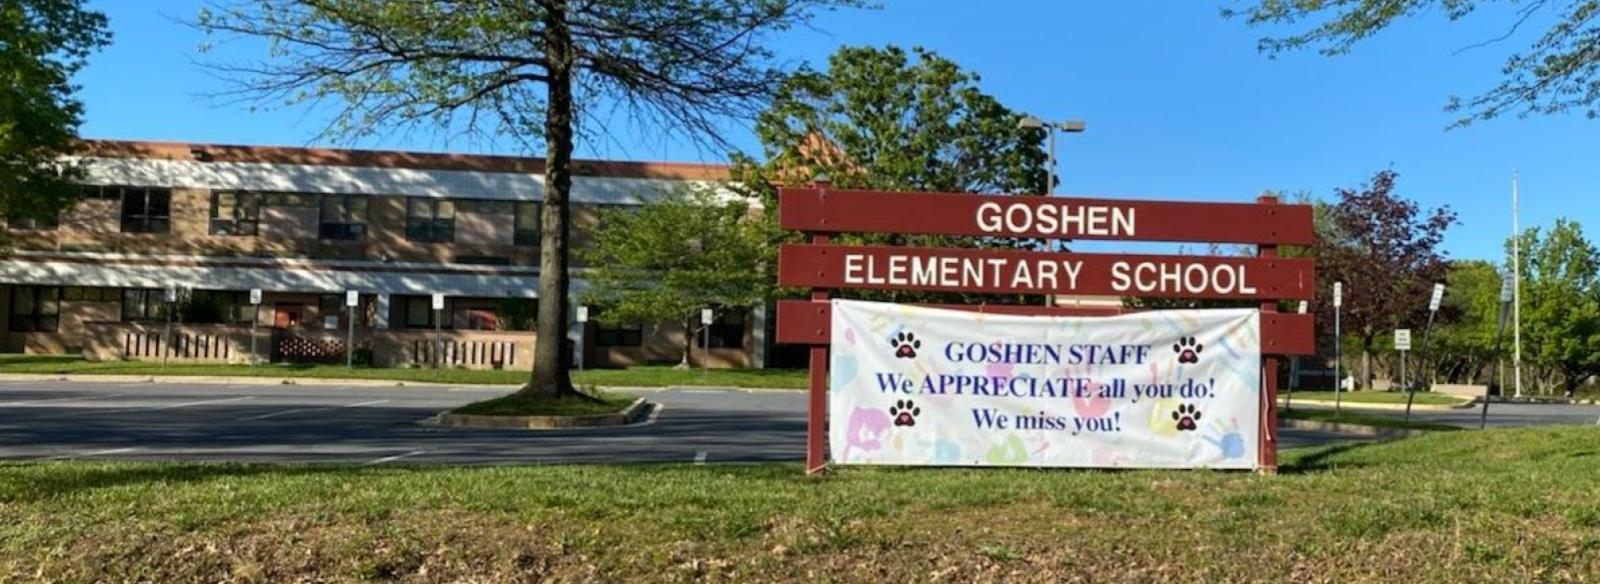 Goshen Elementary School PTA